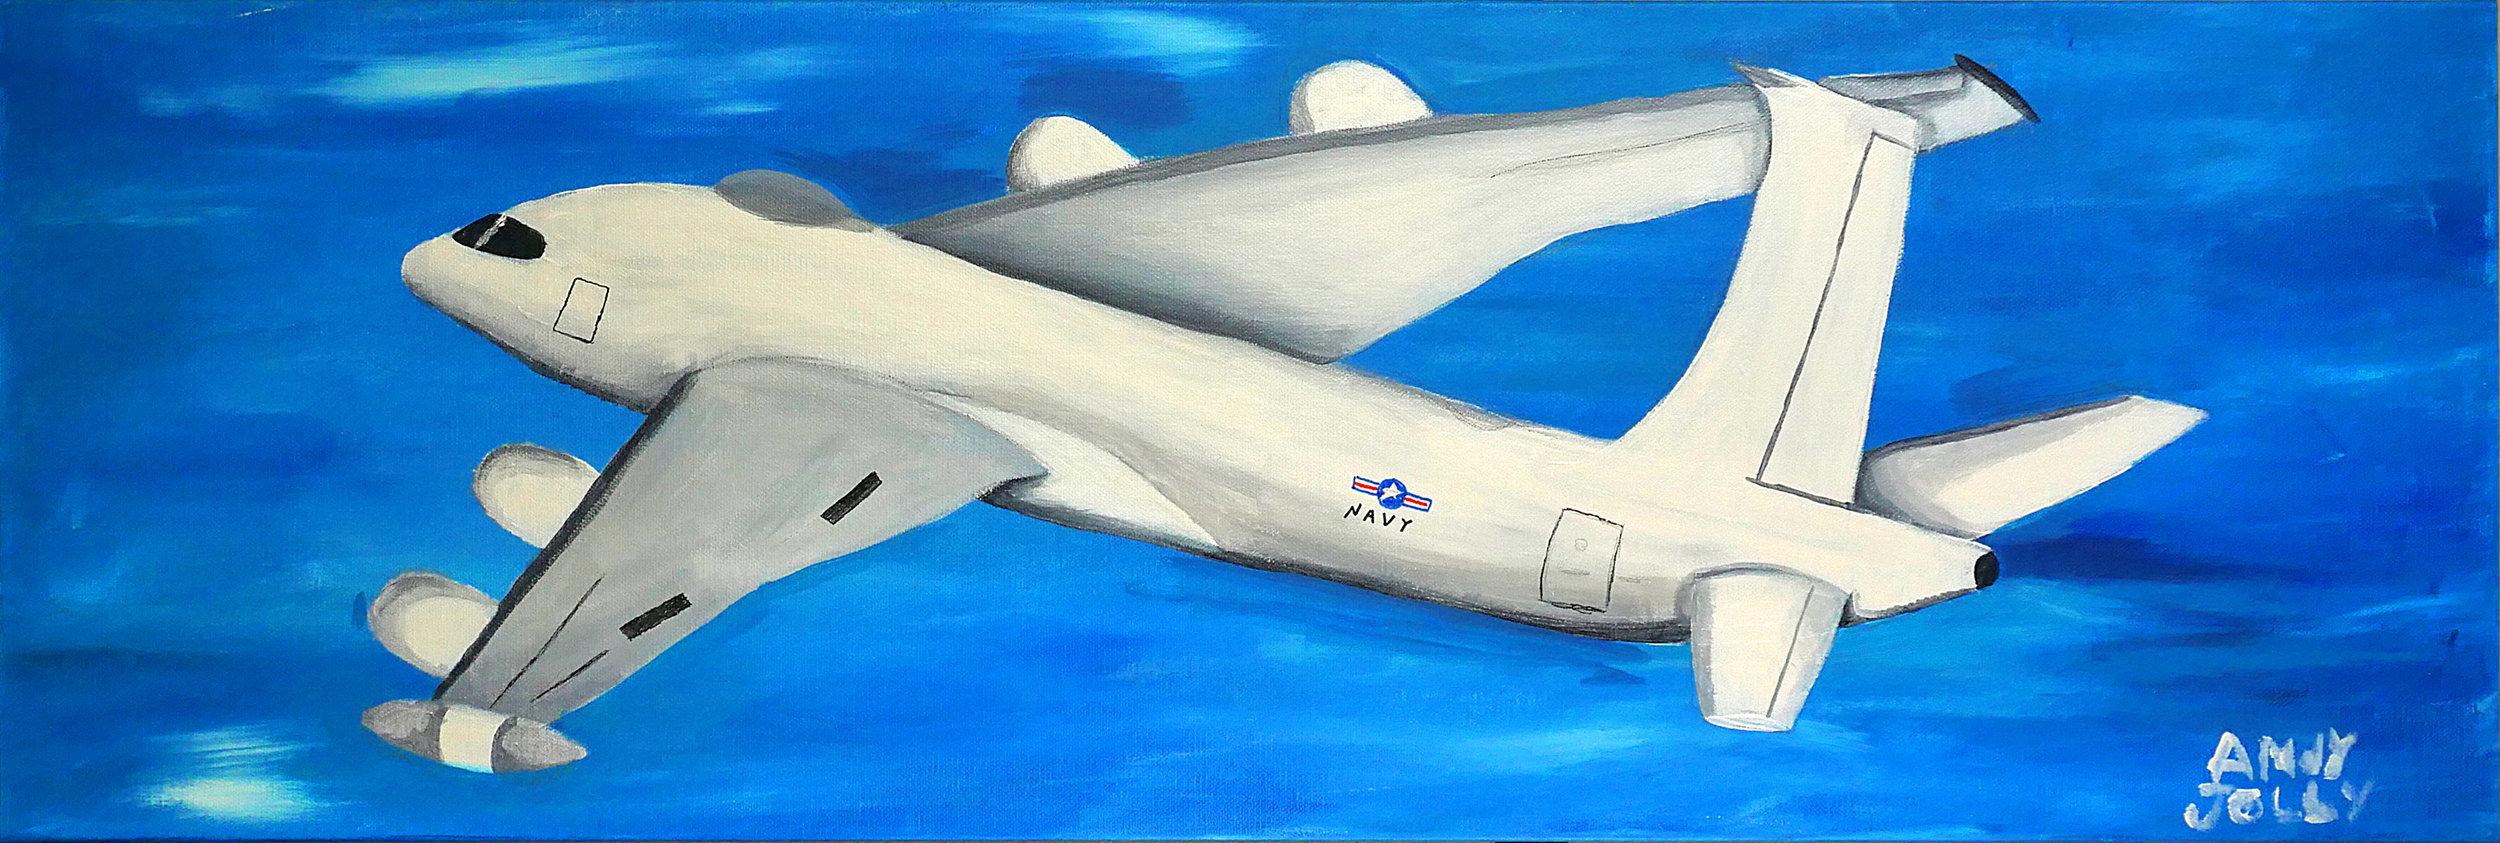 AndyJolly_Airplane.jpg